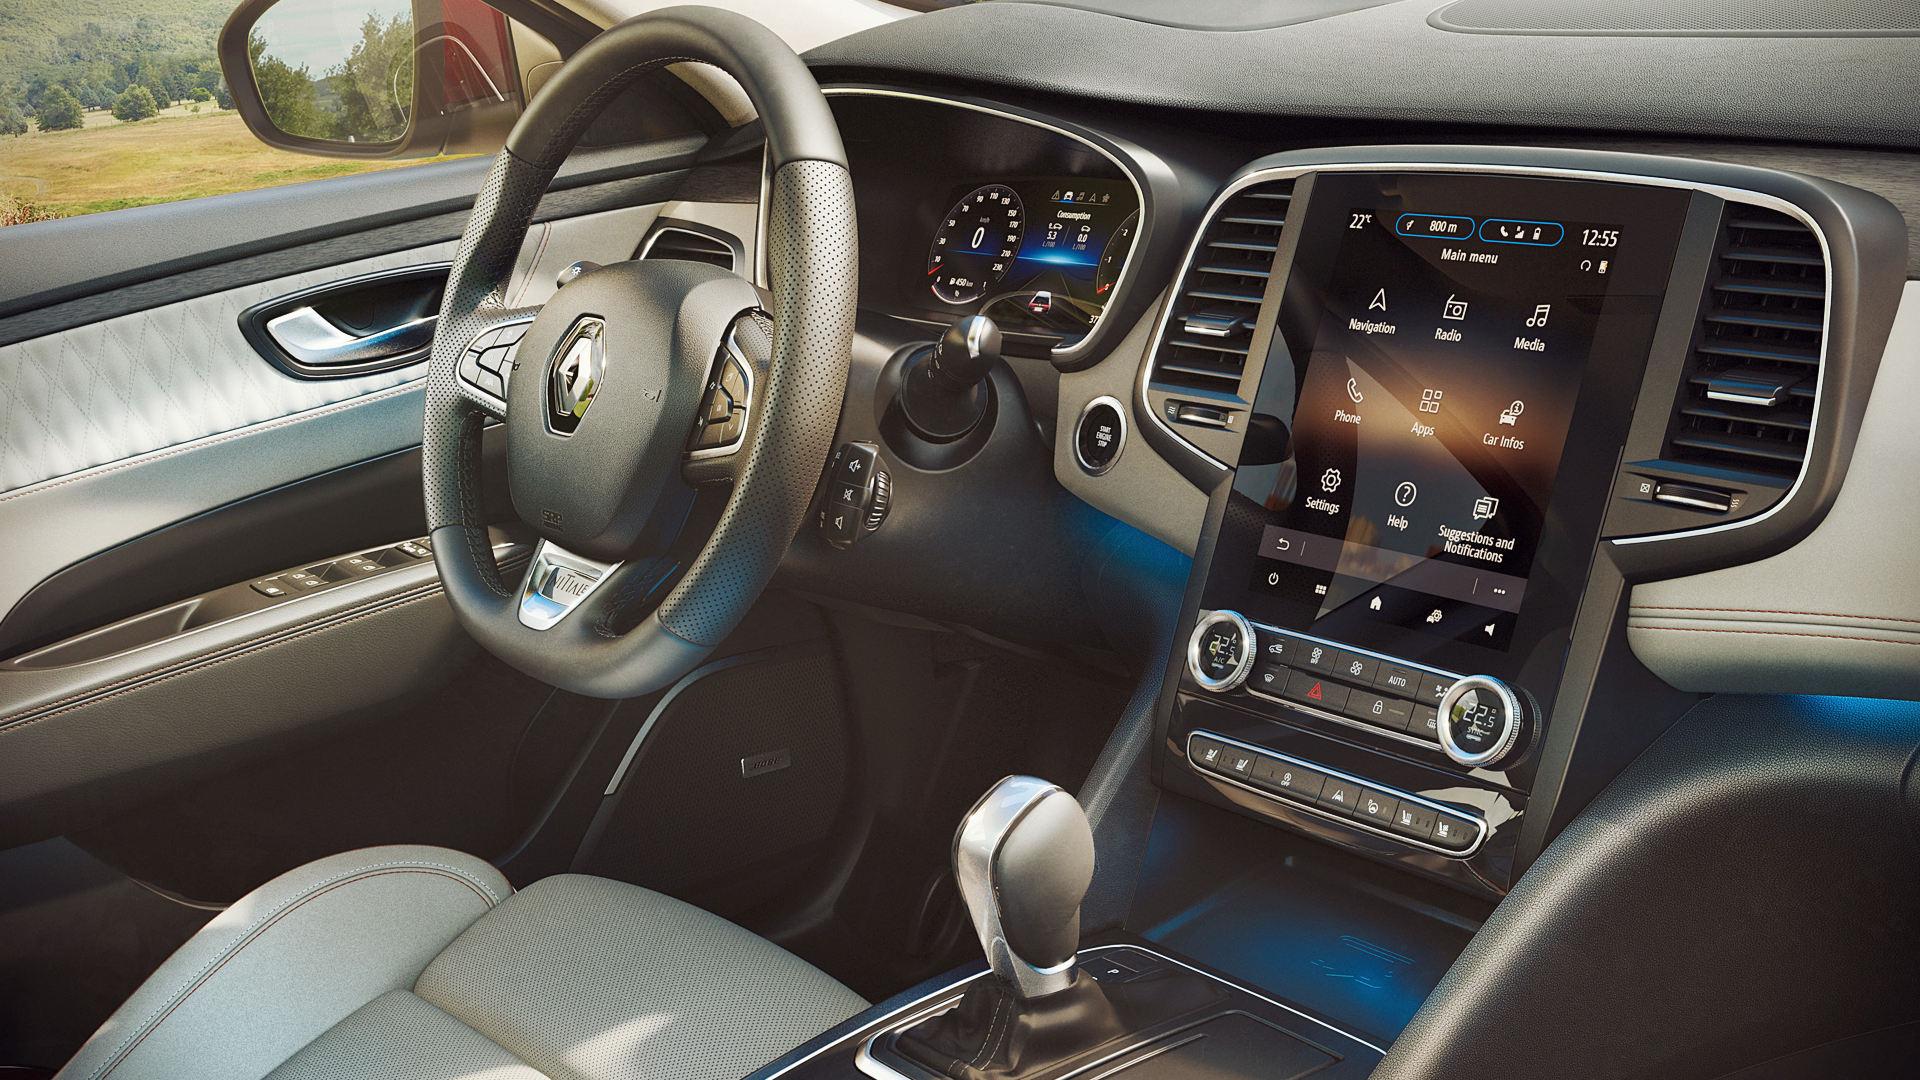 2020 Renault Talisman Interior Wallpaper